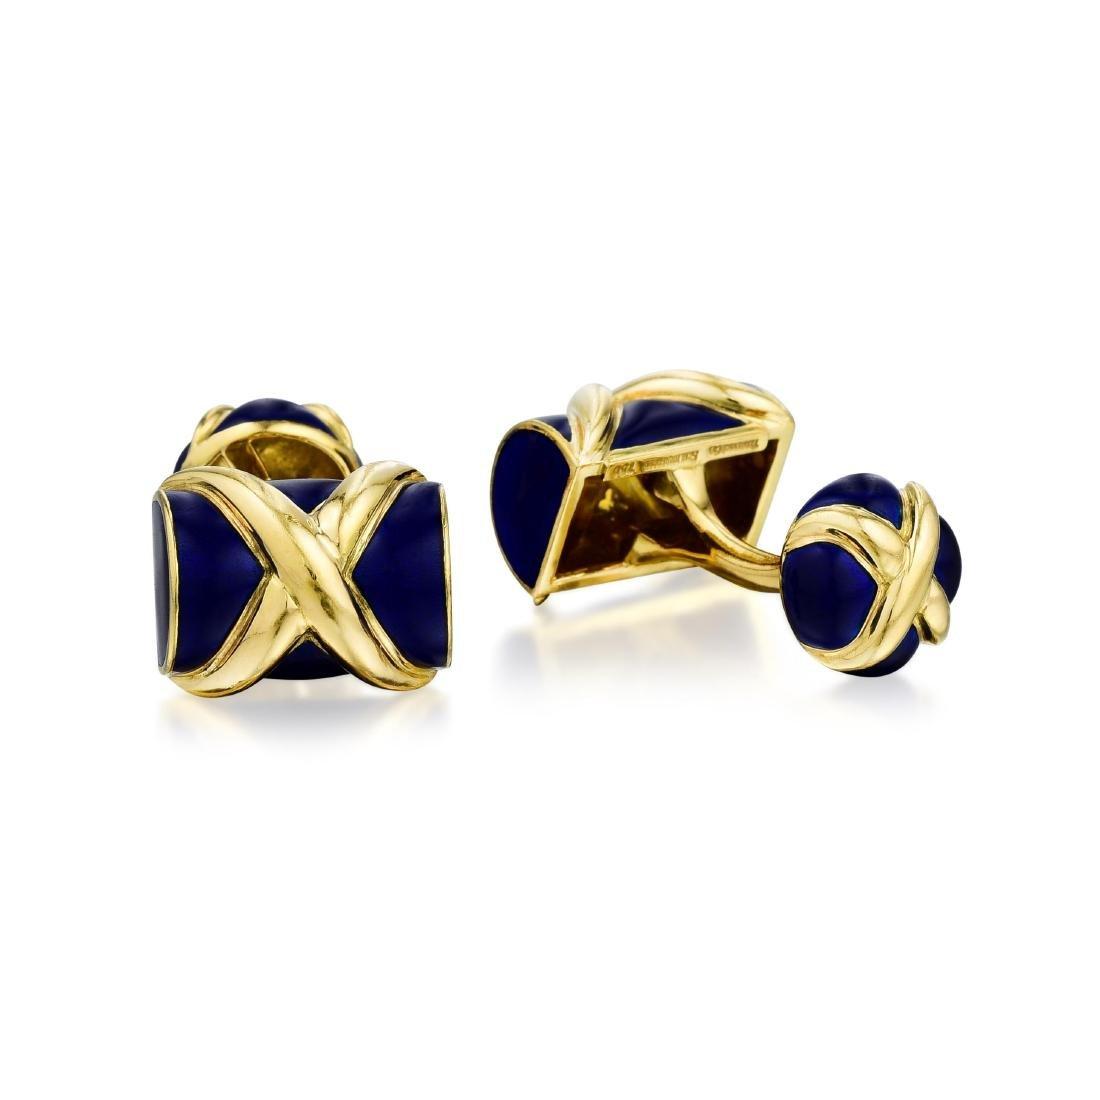 Schlumberger Tiffany & Co. Enamel Gold Cufflinks